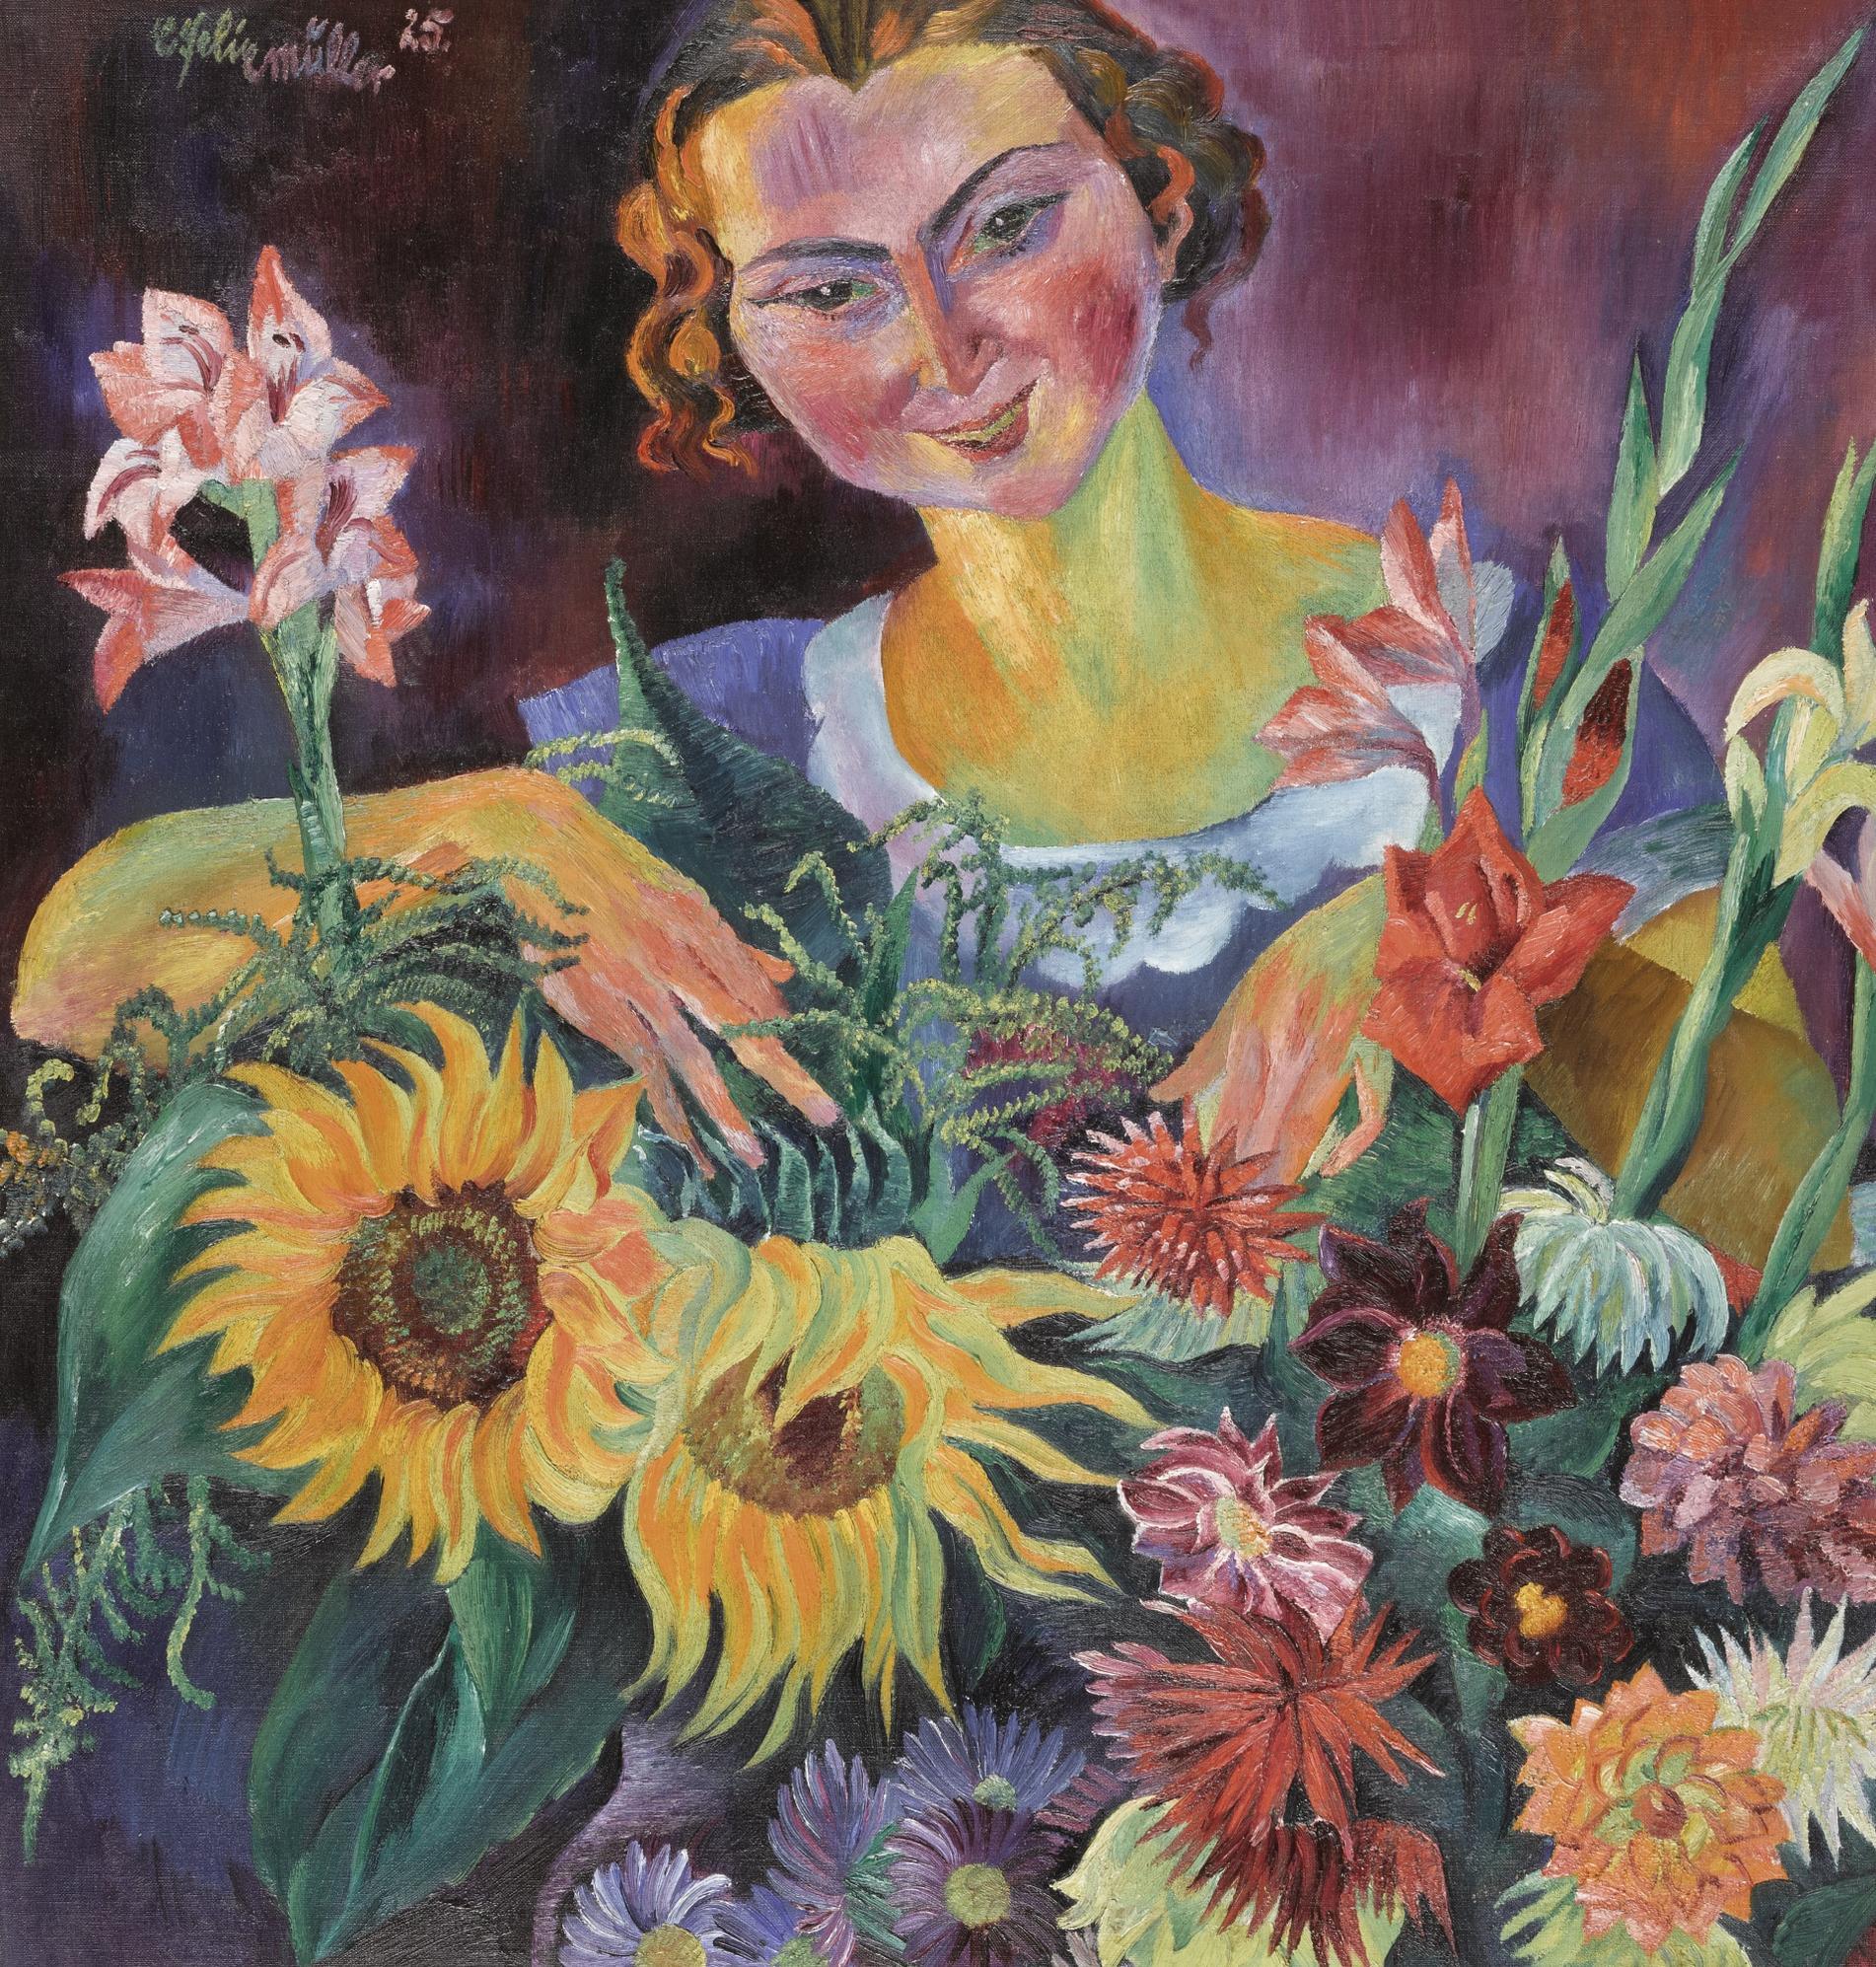 Conrad Felixmuller-Das Blumenmadchen (The Flowergirl) - Recto Huldigung Ans Modell (Honouring The Model) - Verso-1934